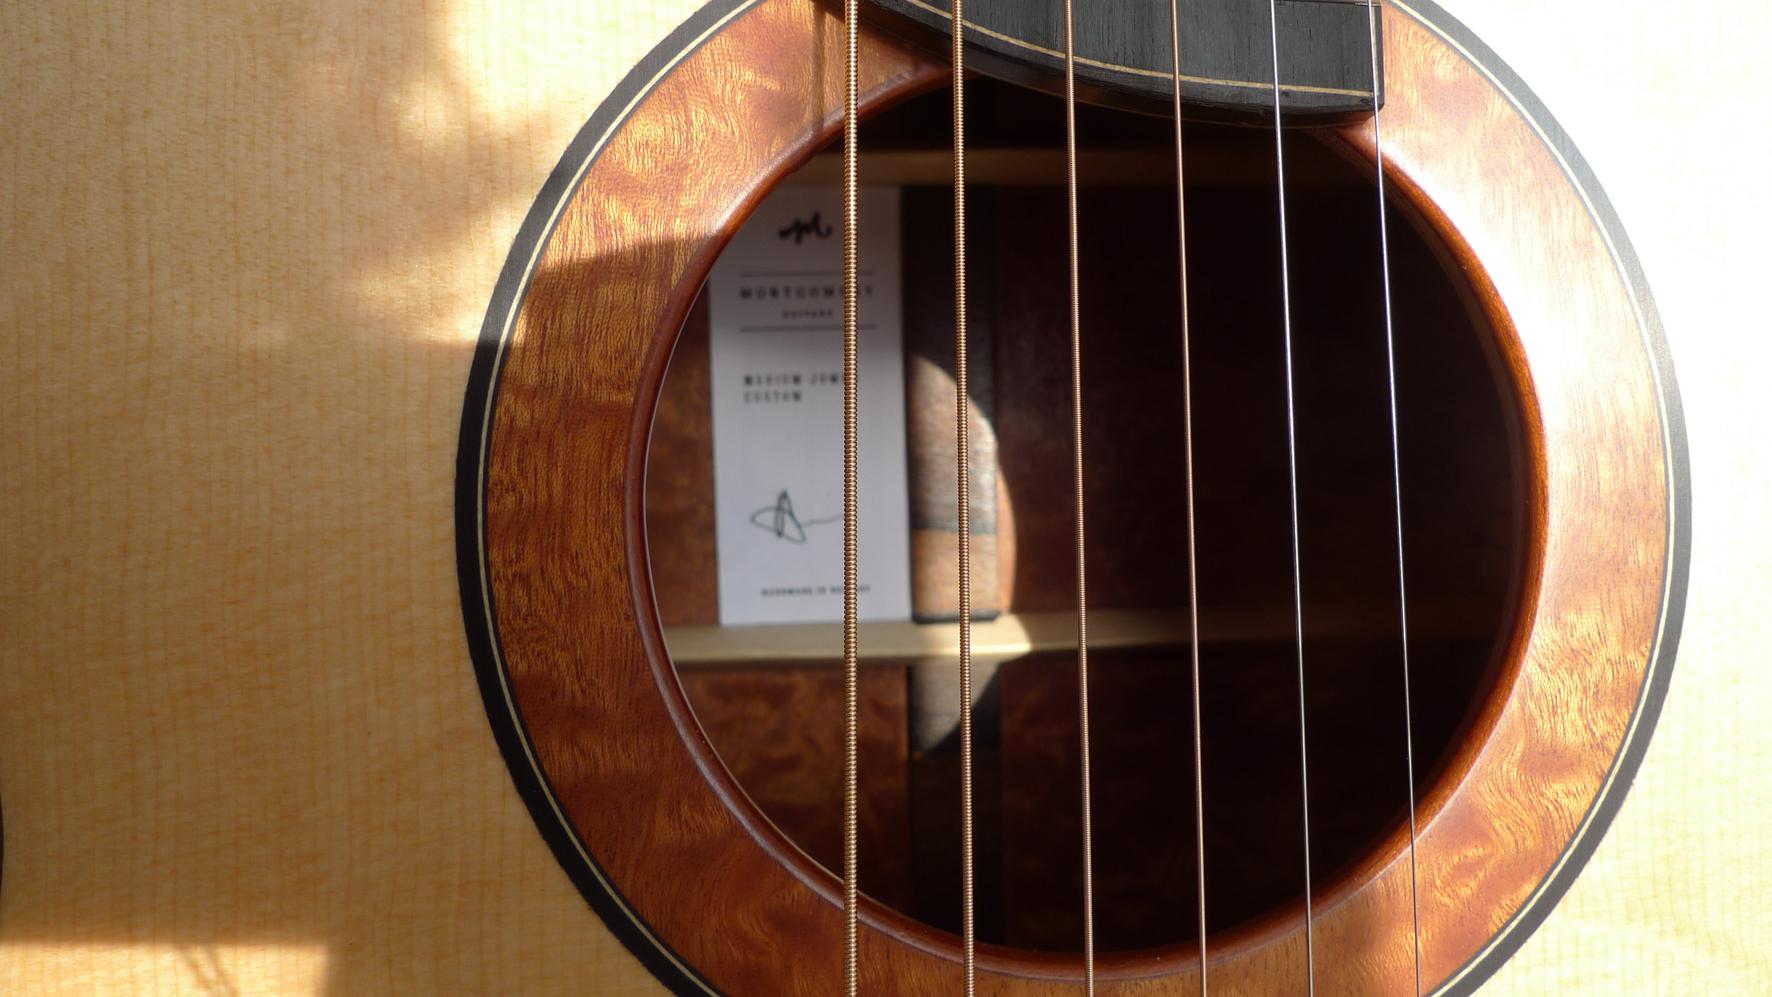 Montgomery guitars, rosette, inlay